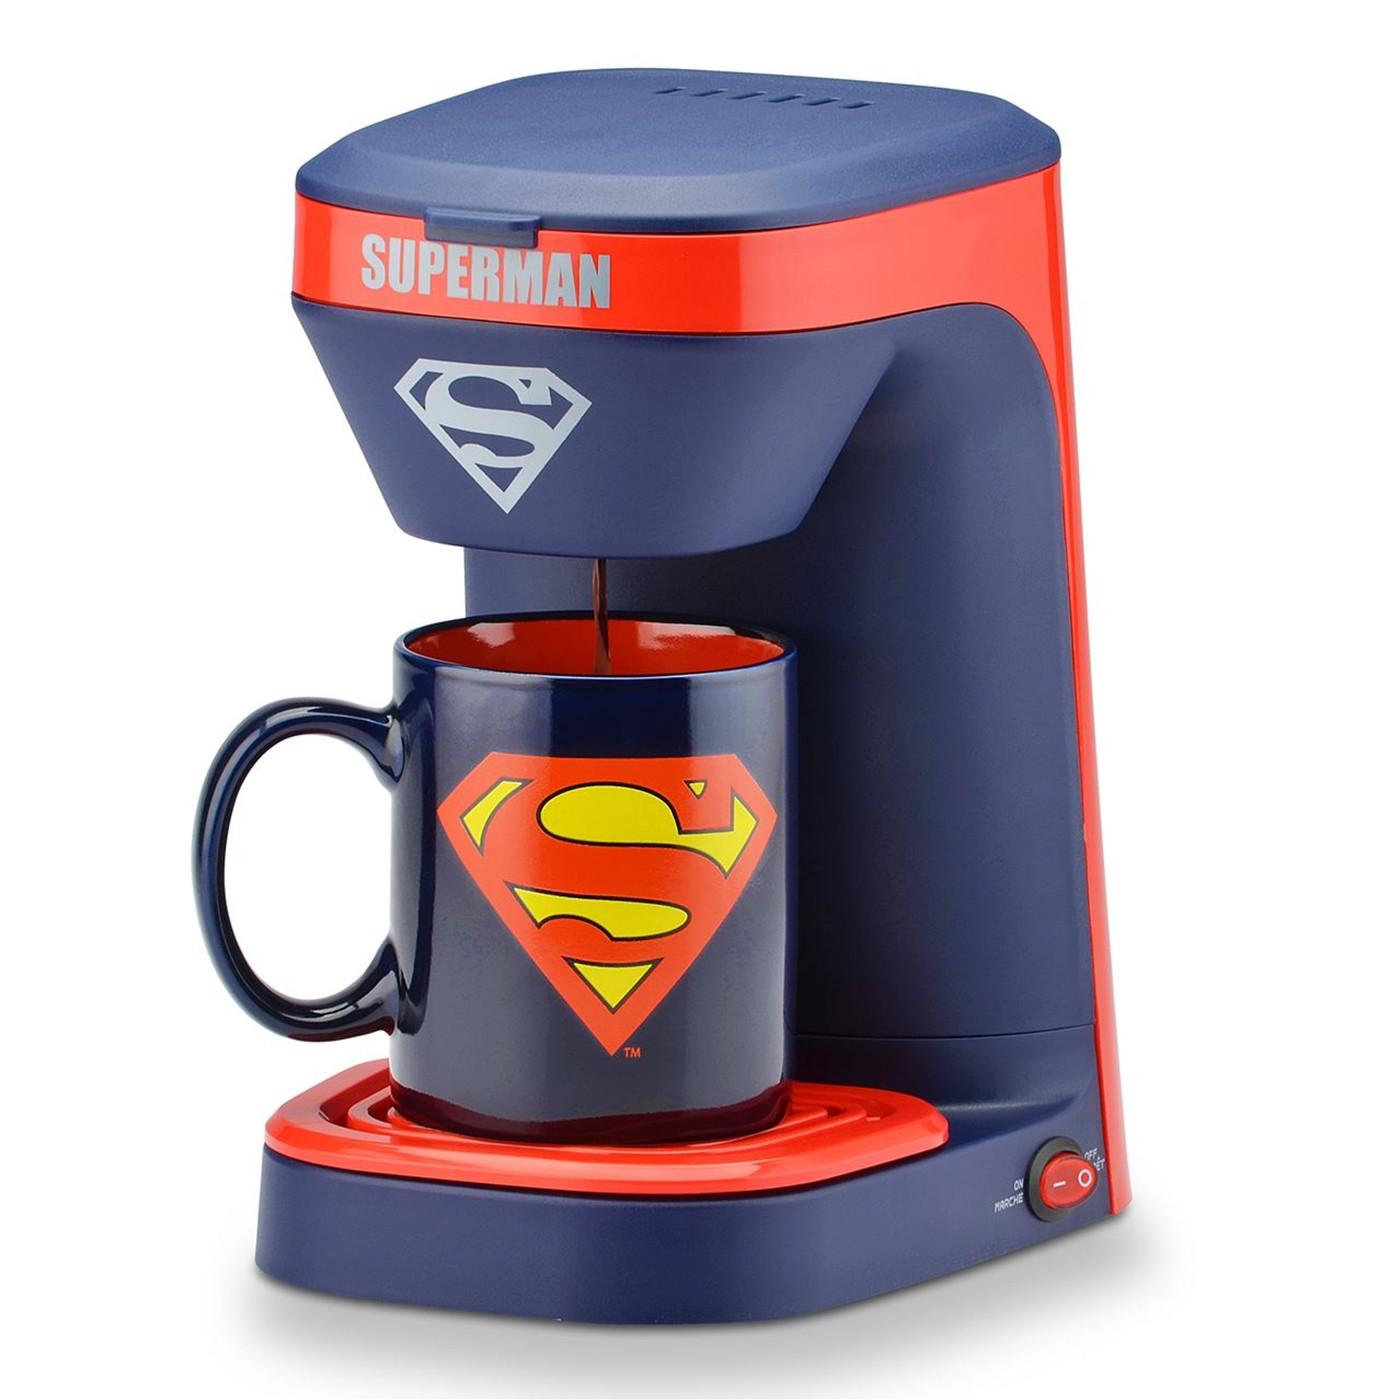 Superman 1-Cup Coffee Maker with Mug